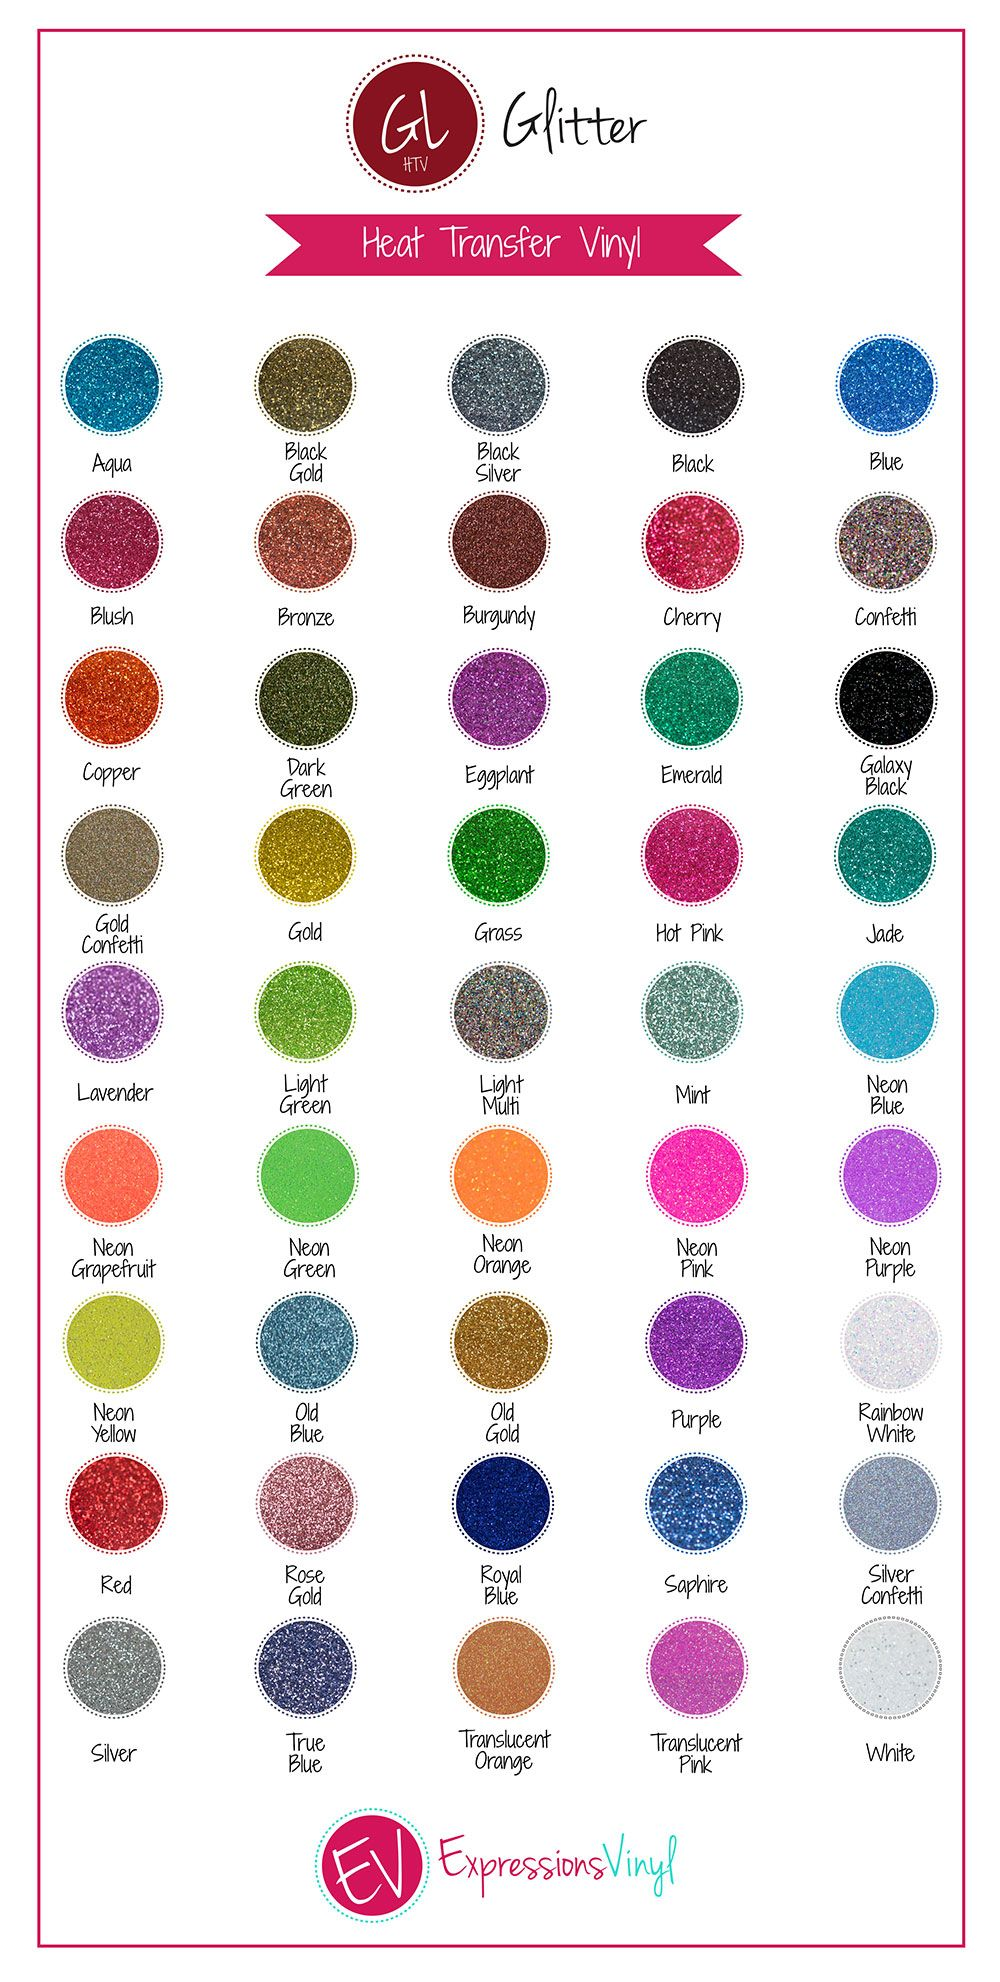 Glitter Heat Transfer Vinyl Color Chart Expressions Vinyl Glitter Heat Transfer Vinyl Cricut Vinyl